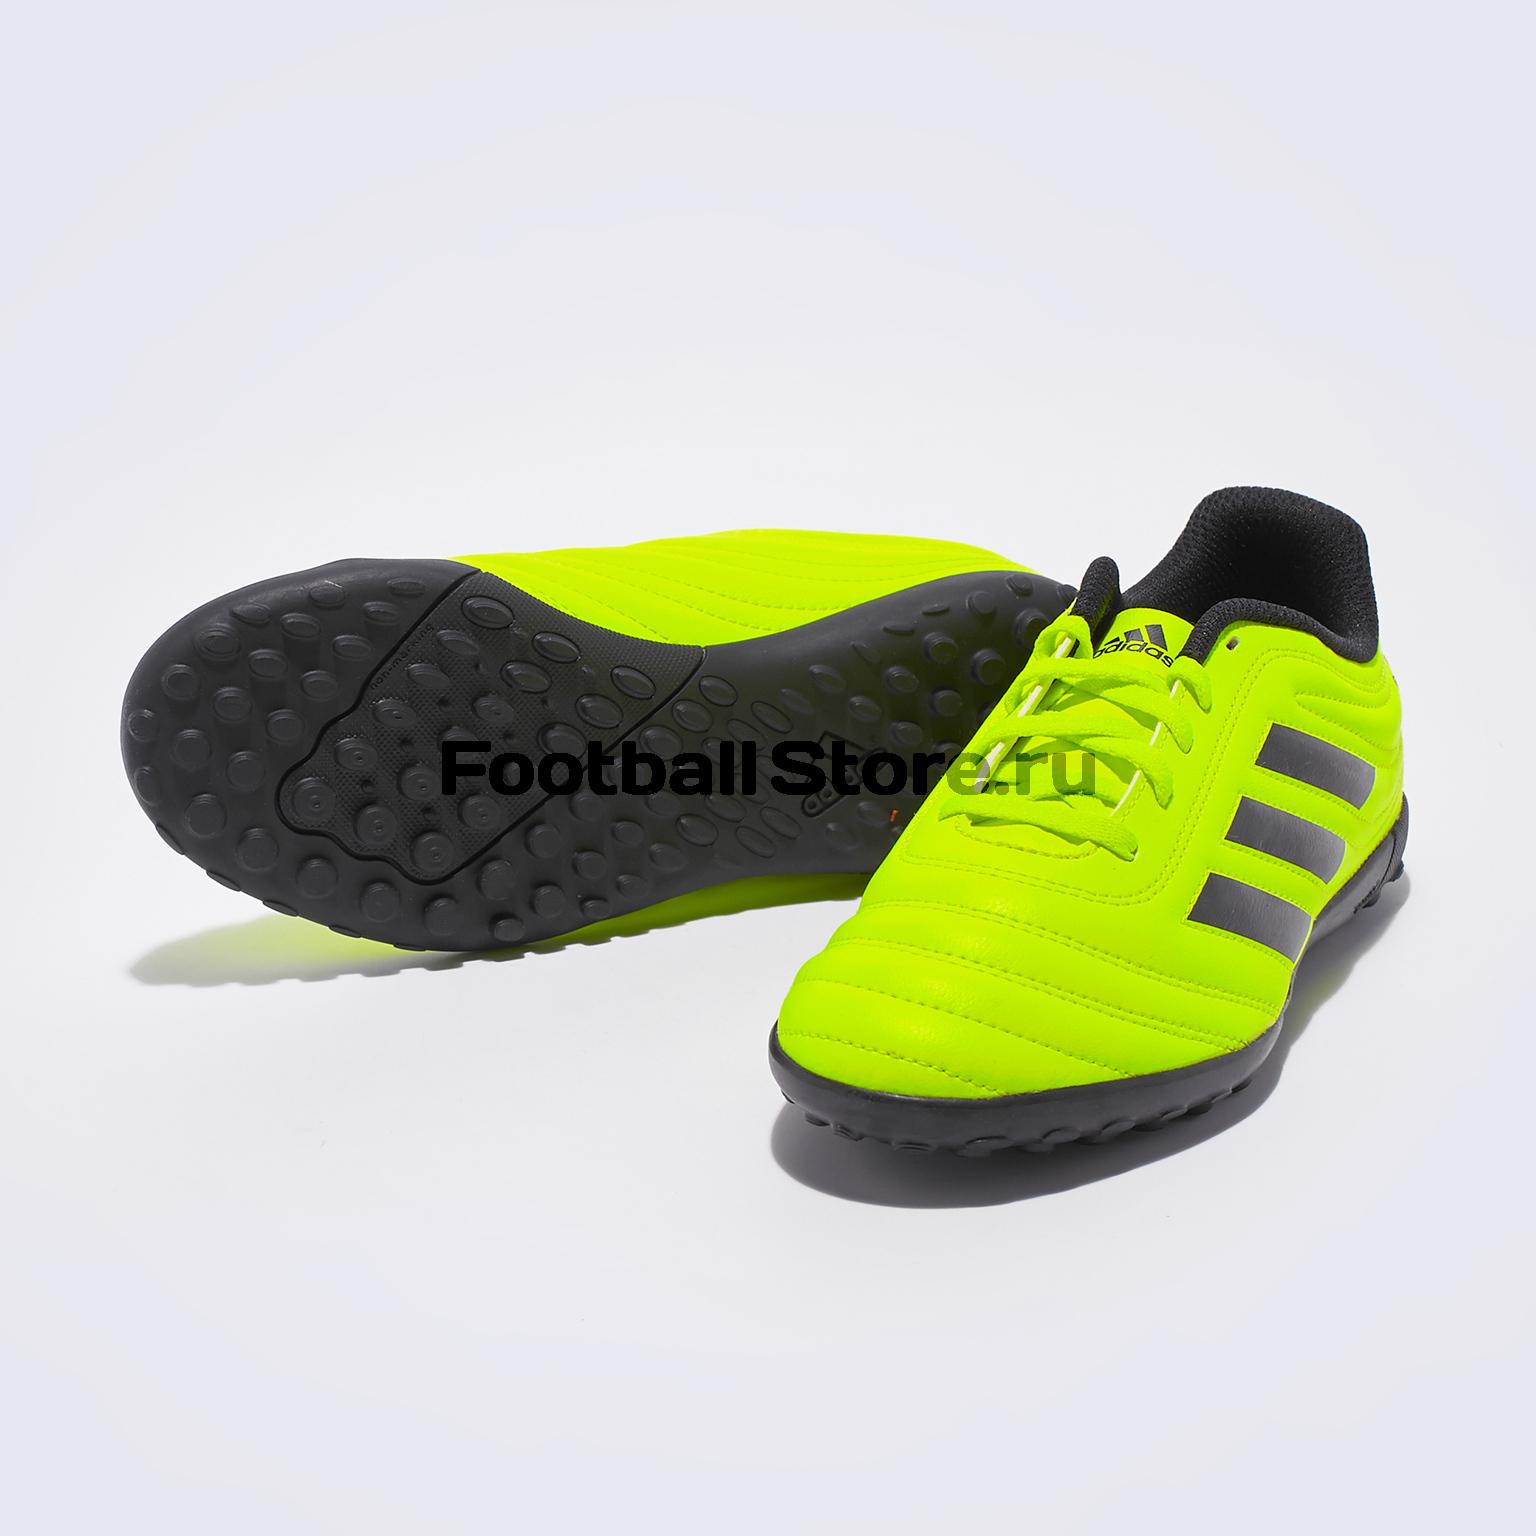 Шиповки детские Adidas Copa 19.4 TF F35457 шиповки детские adidas x tango 18 3 tf db2422